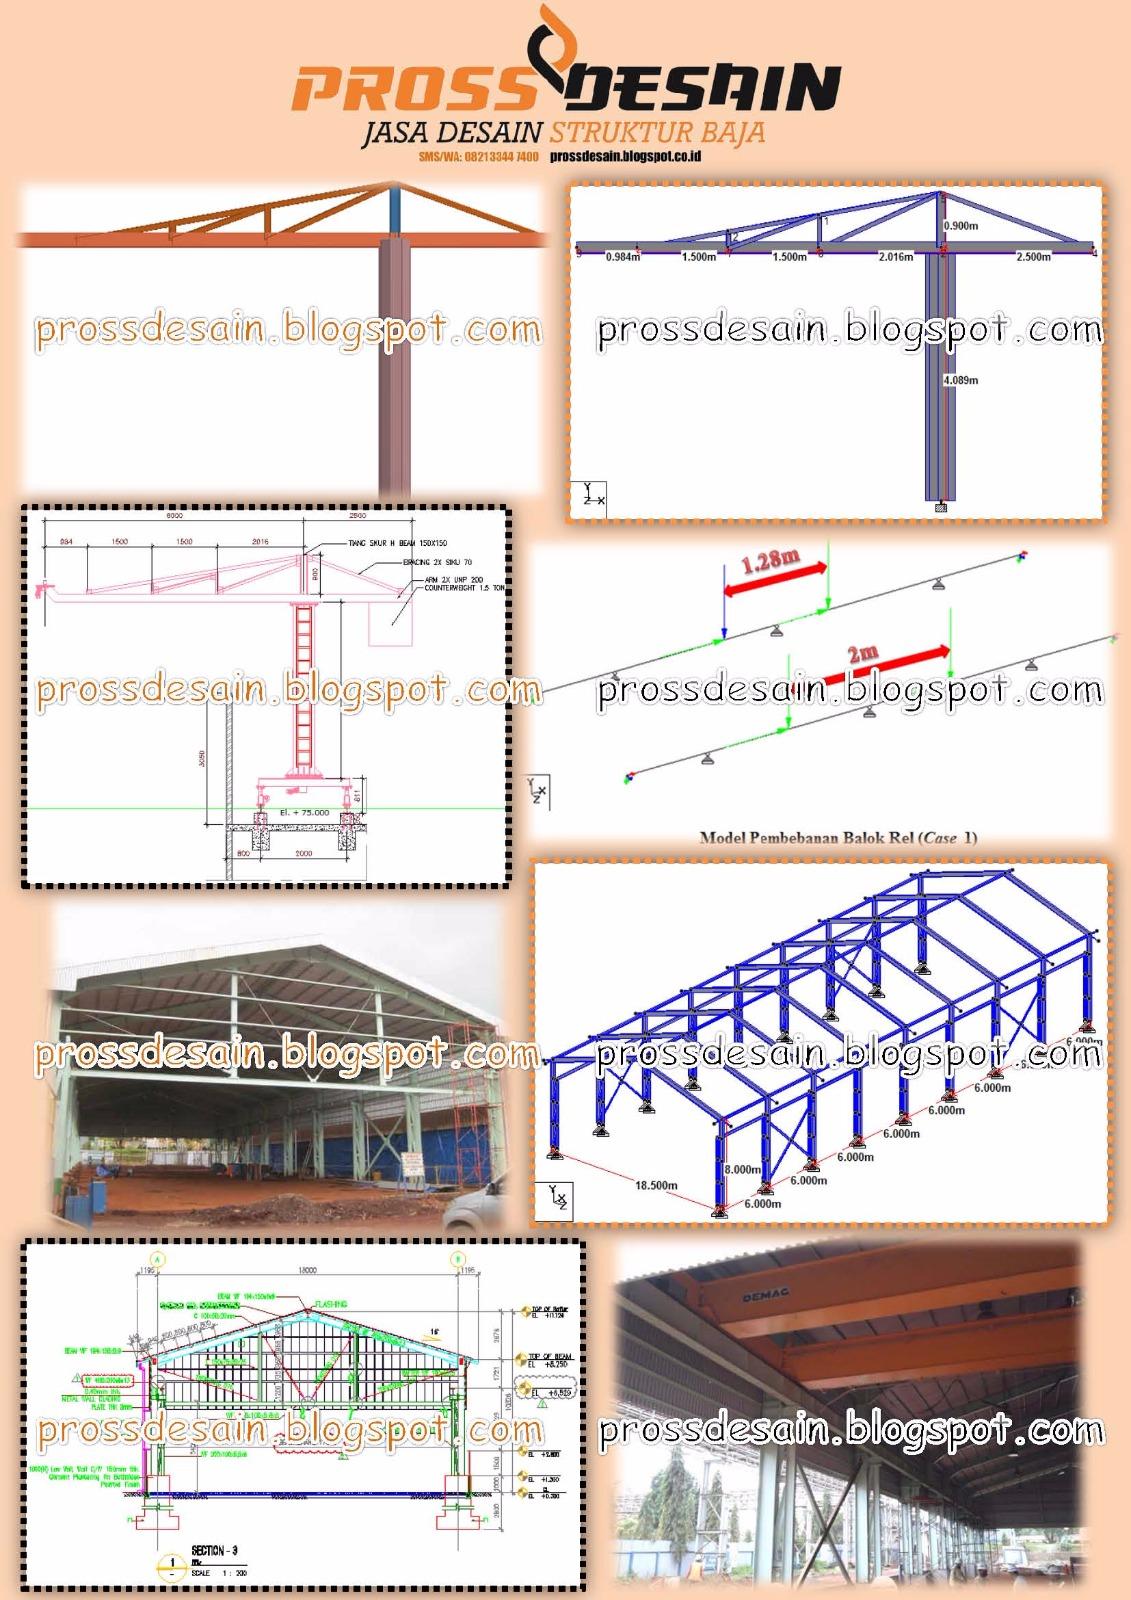 Jasa Desain Struktur Baja